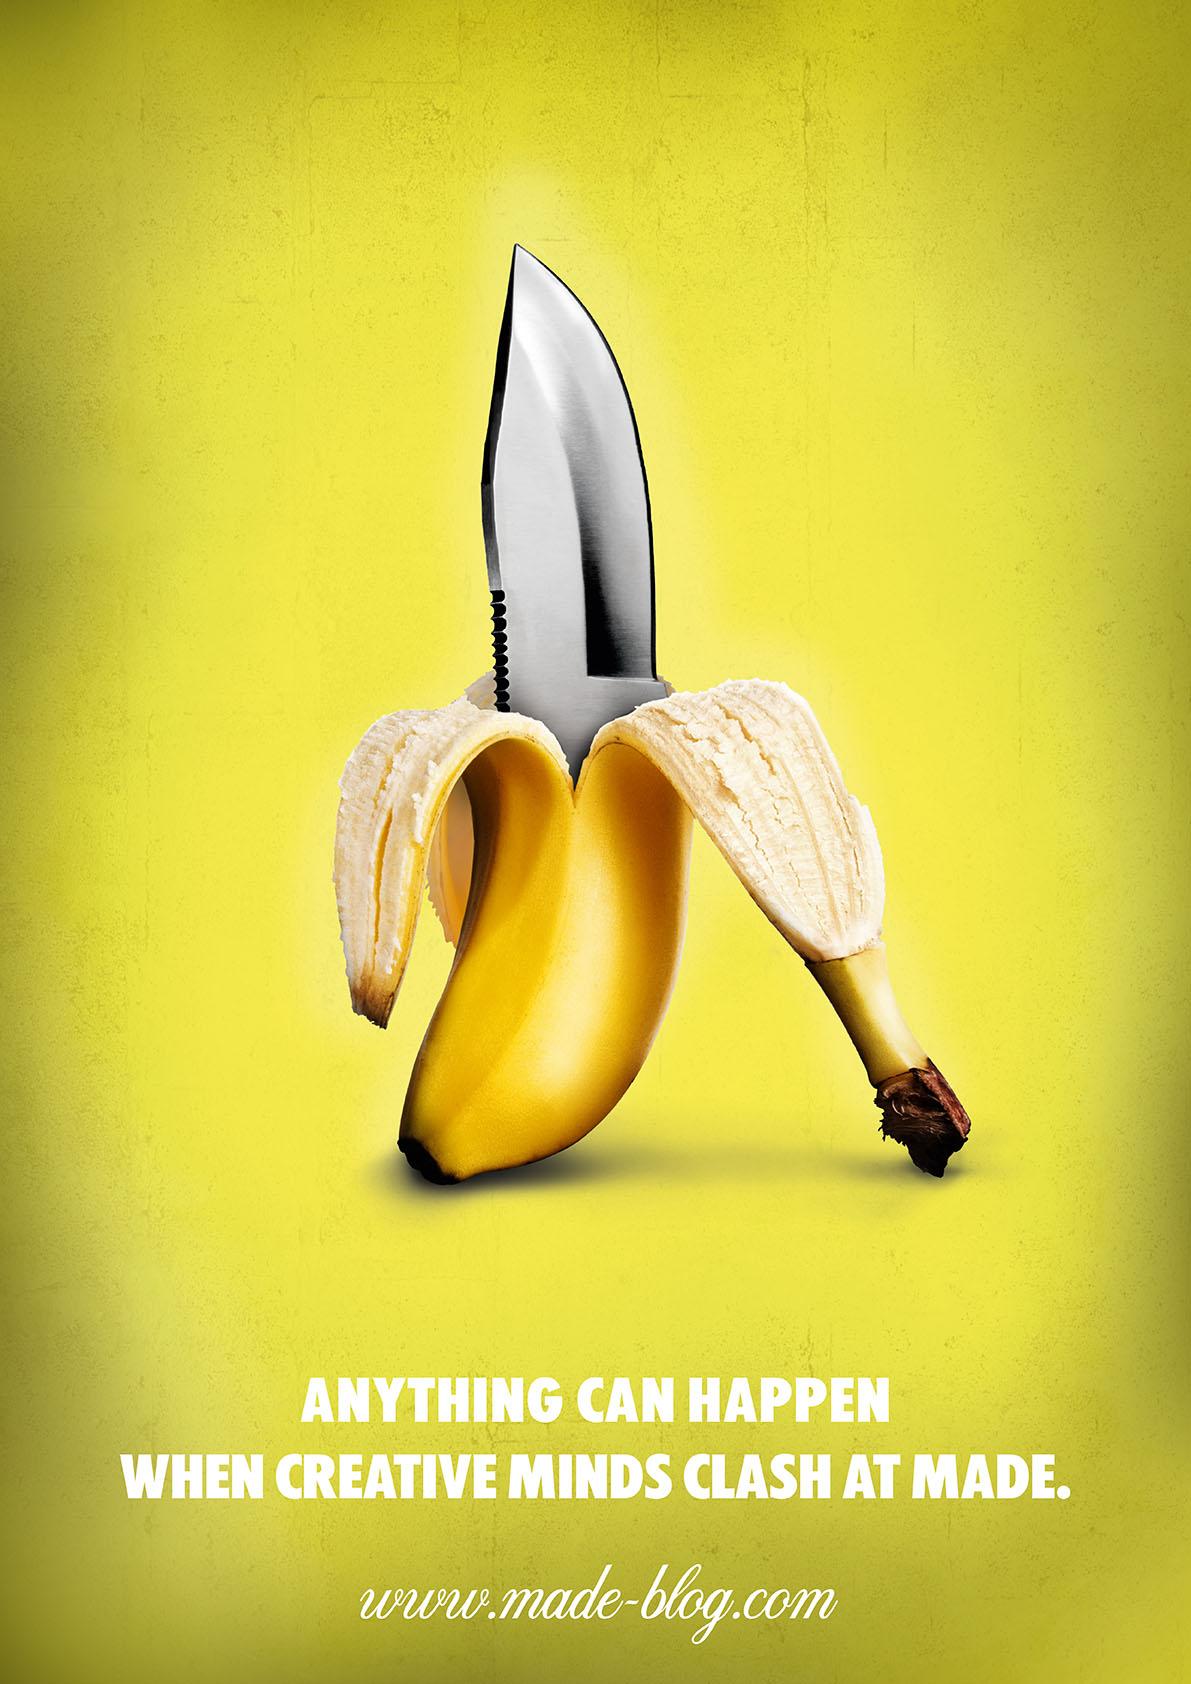 Made-Banana